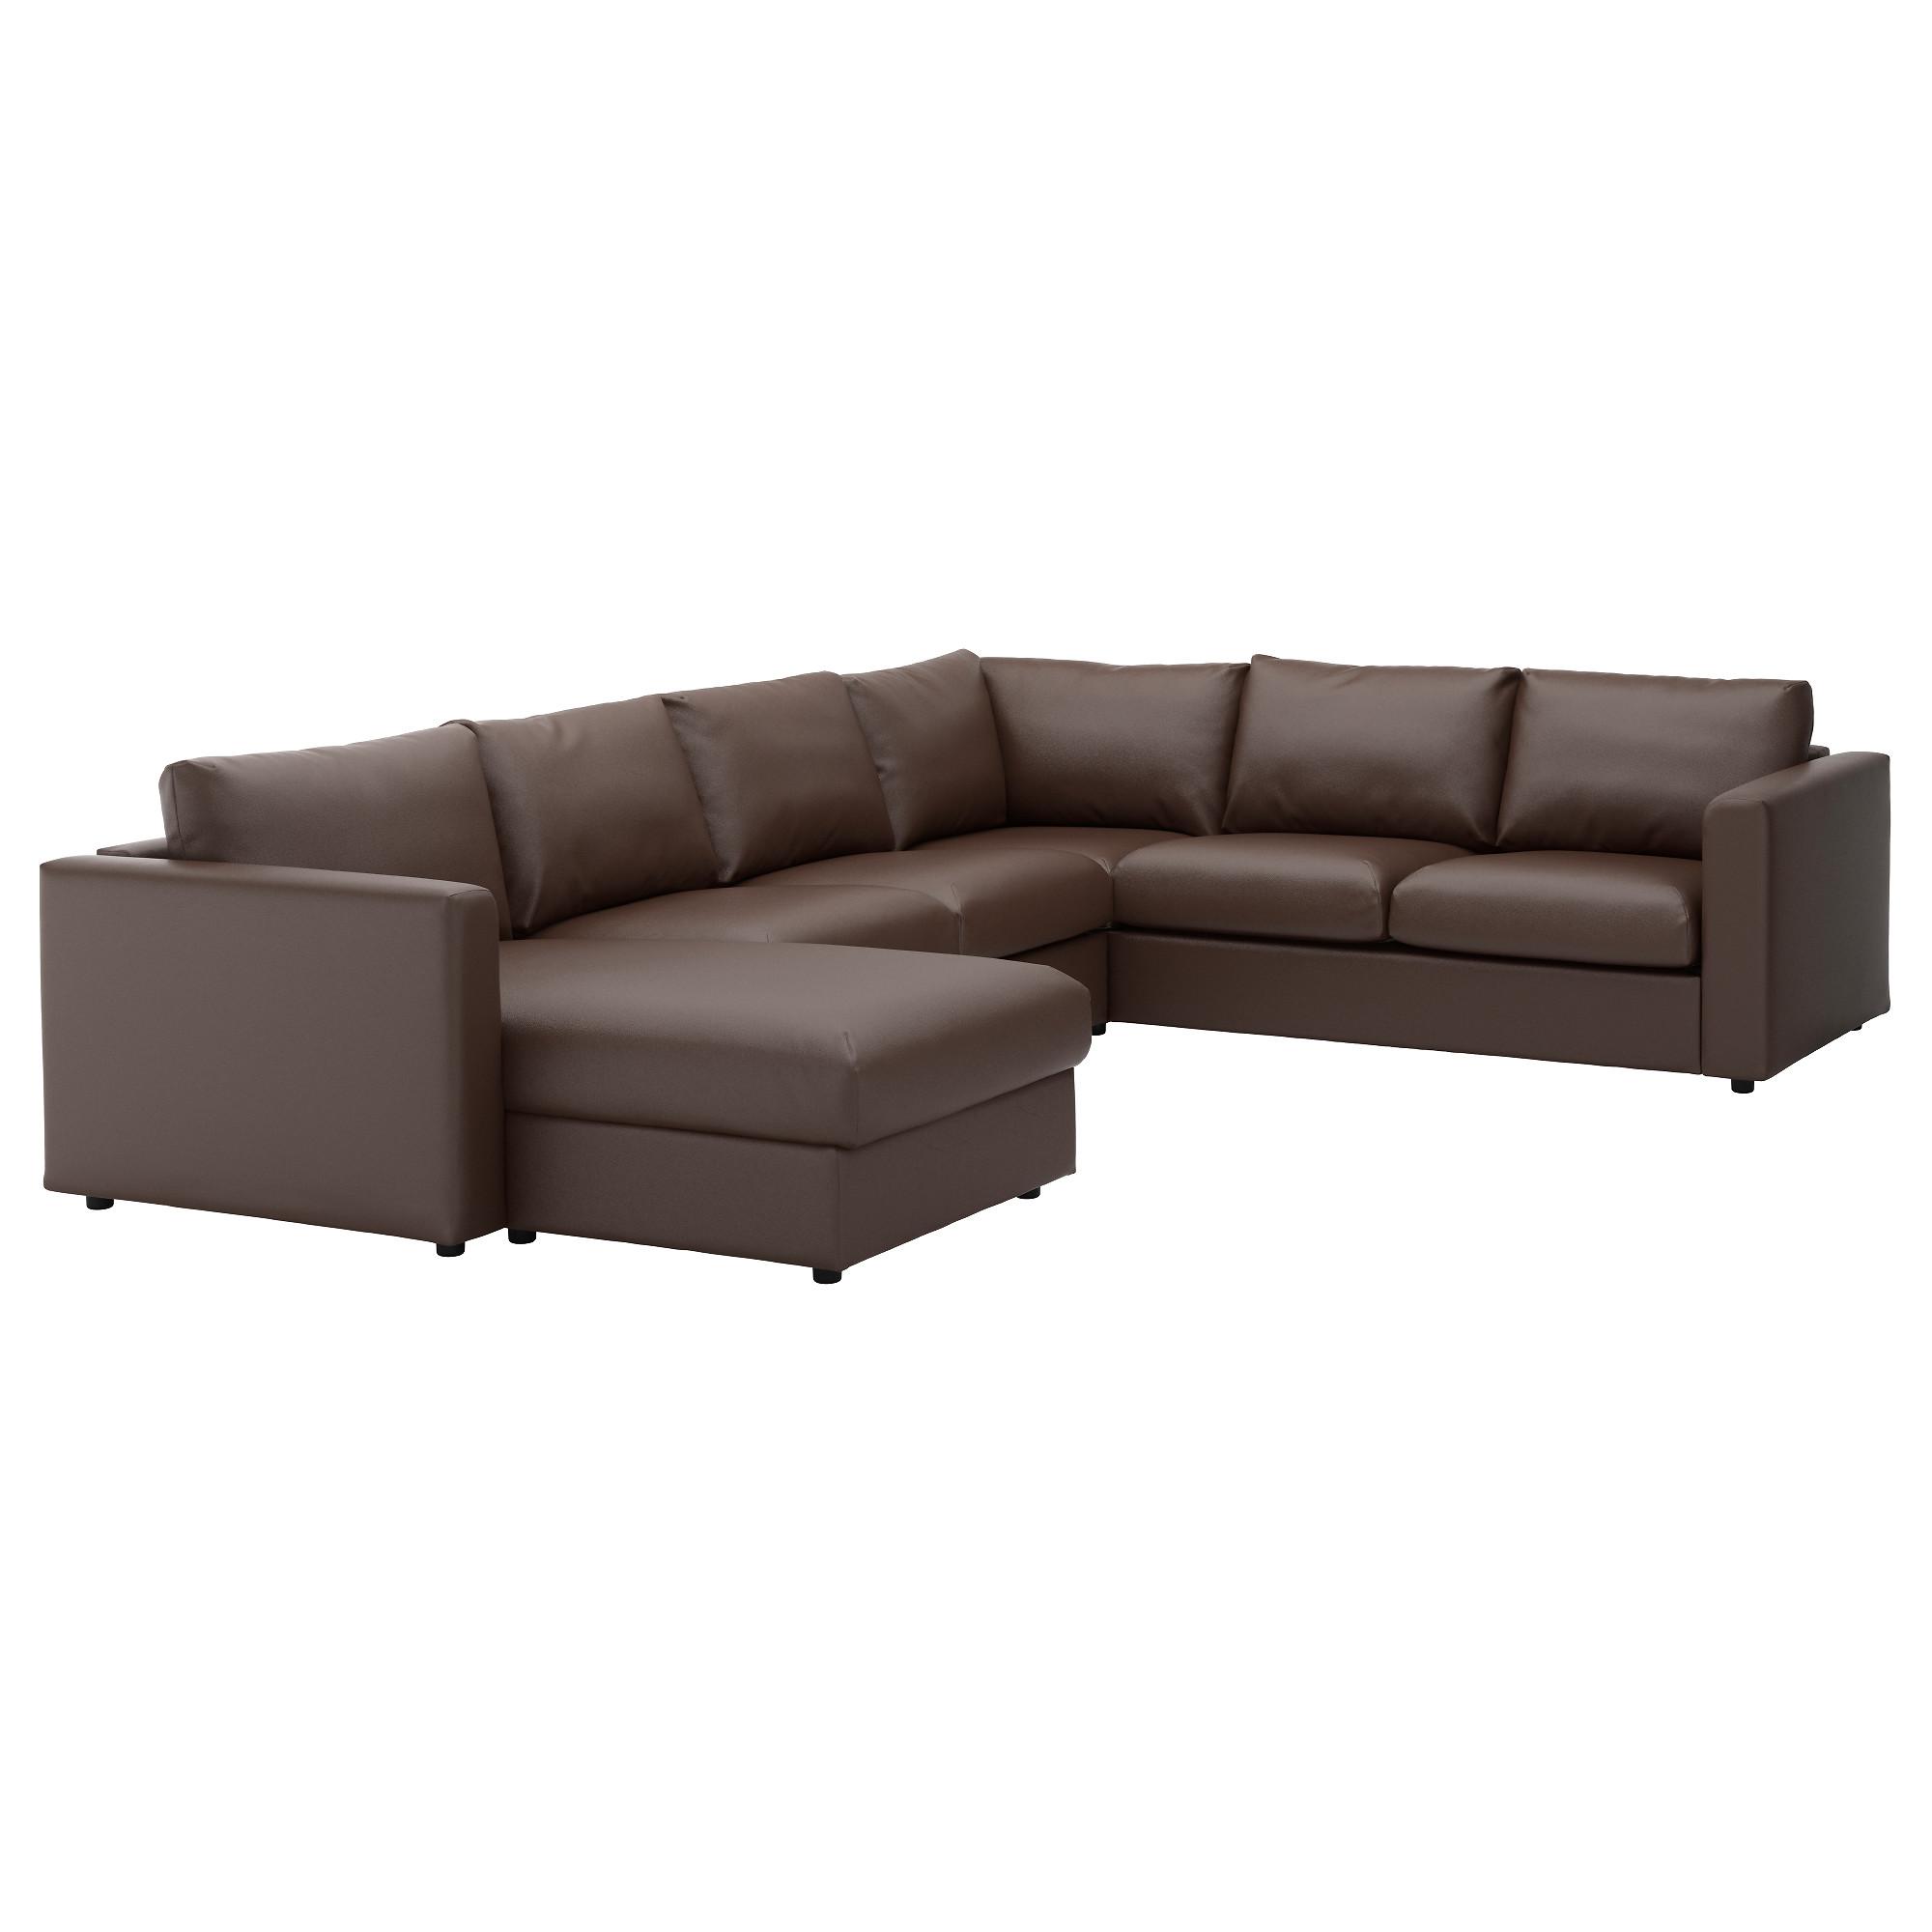 ikea vimle corner sofa, 5-seat 10 year guarantee. read about the terms IOBPBUK